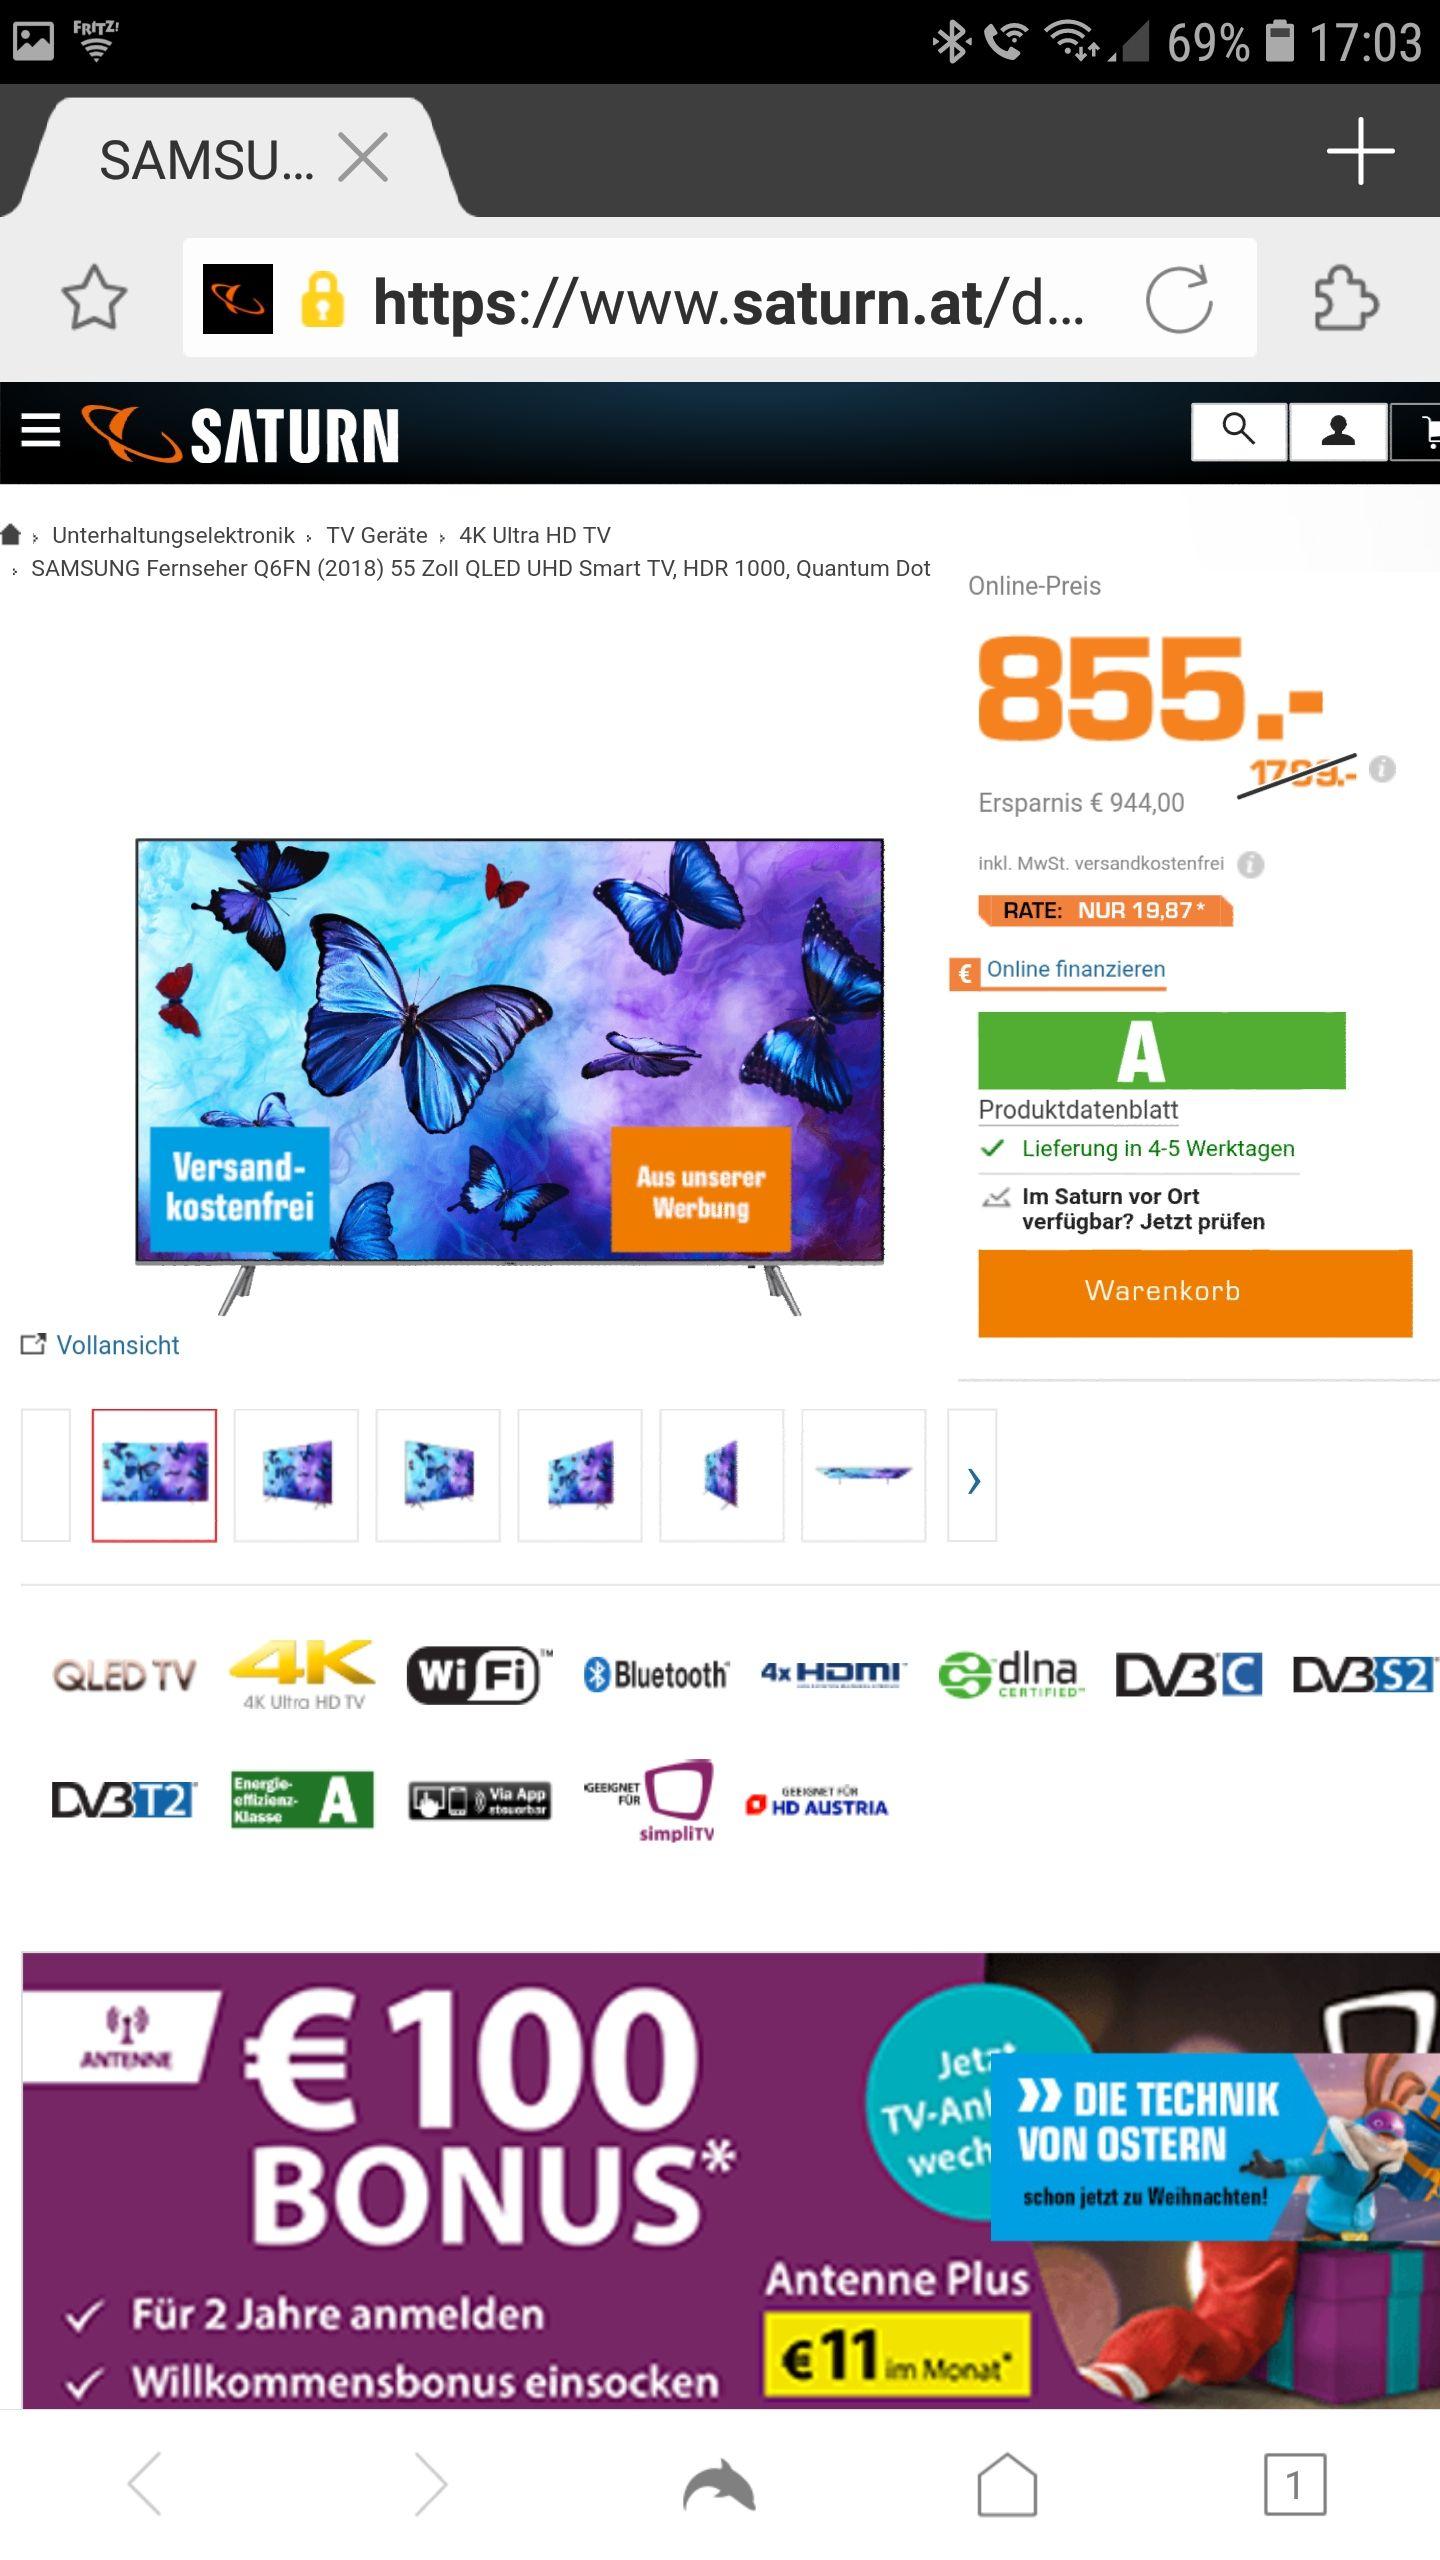 "Samsung QLED 55"" Q6FN Model"